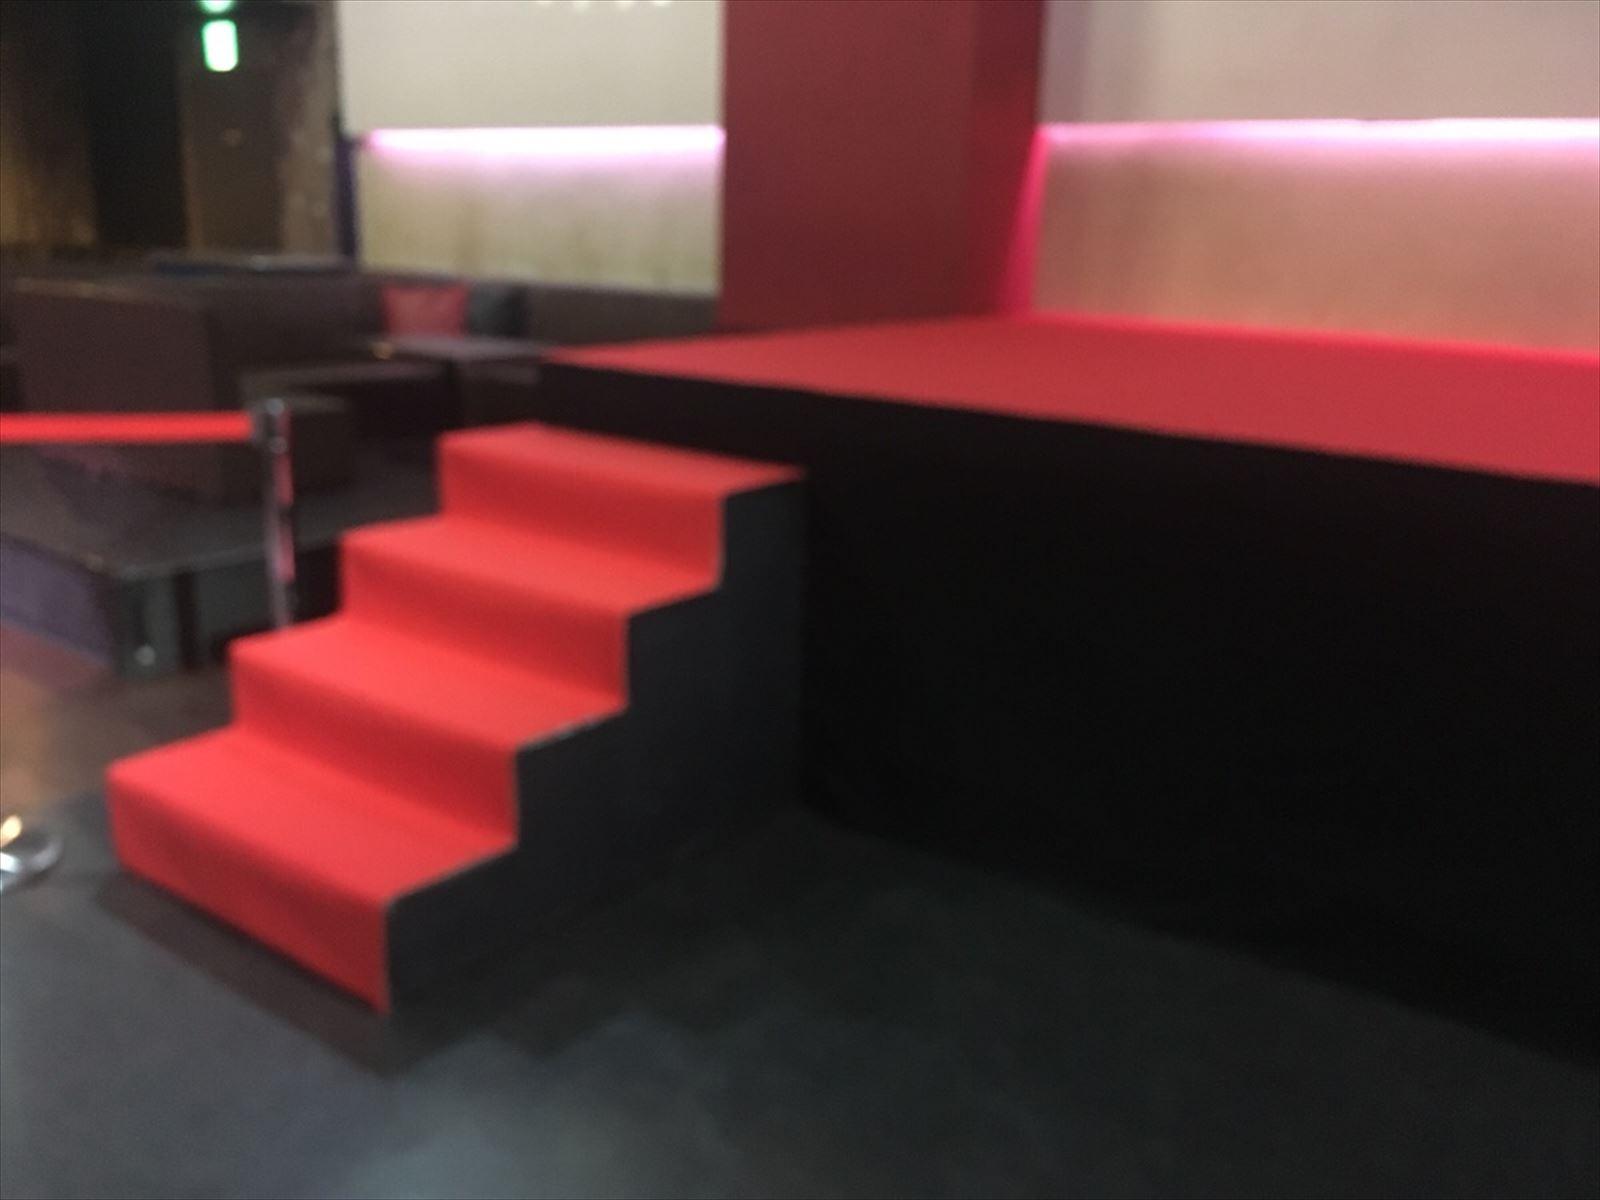 1mステップ階段なら神奈川イベント会社